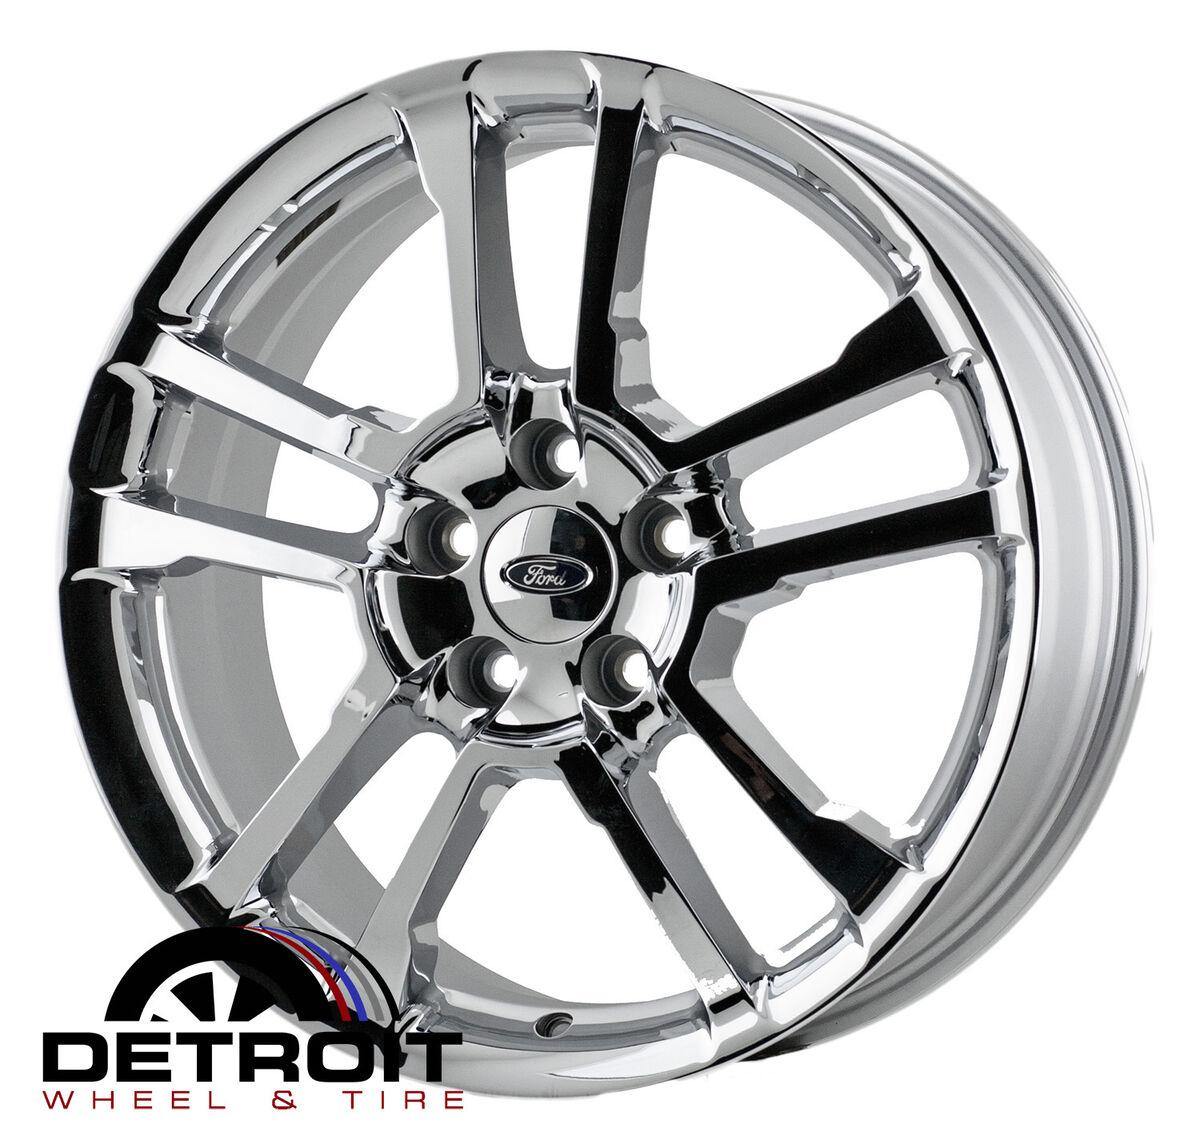 Ford Fusion 18 Chrome Wheels Rims Factory Wheels Set of 4